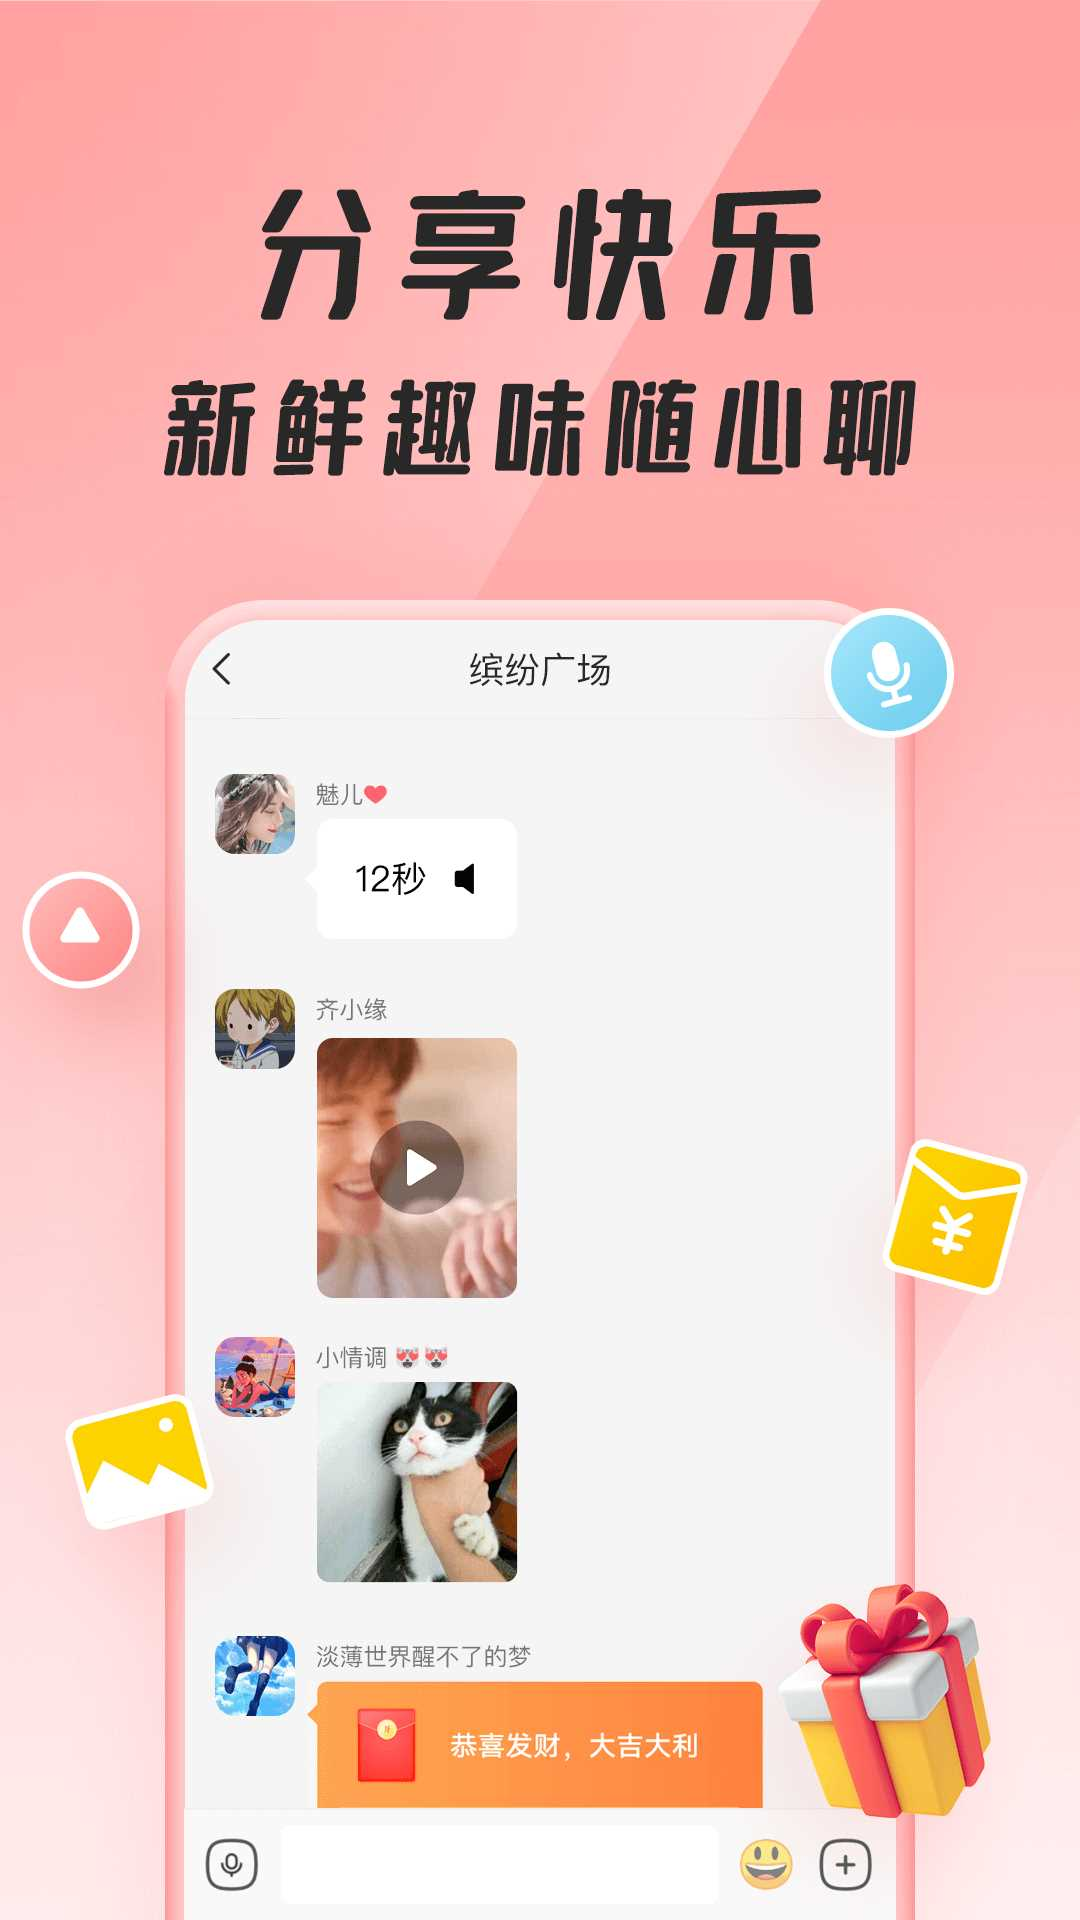 beanfun下载破解版v1.0.1.210710截图欣赏